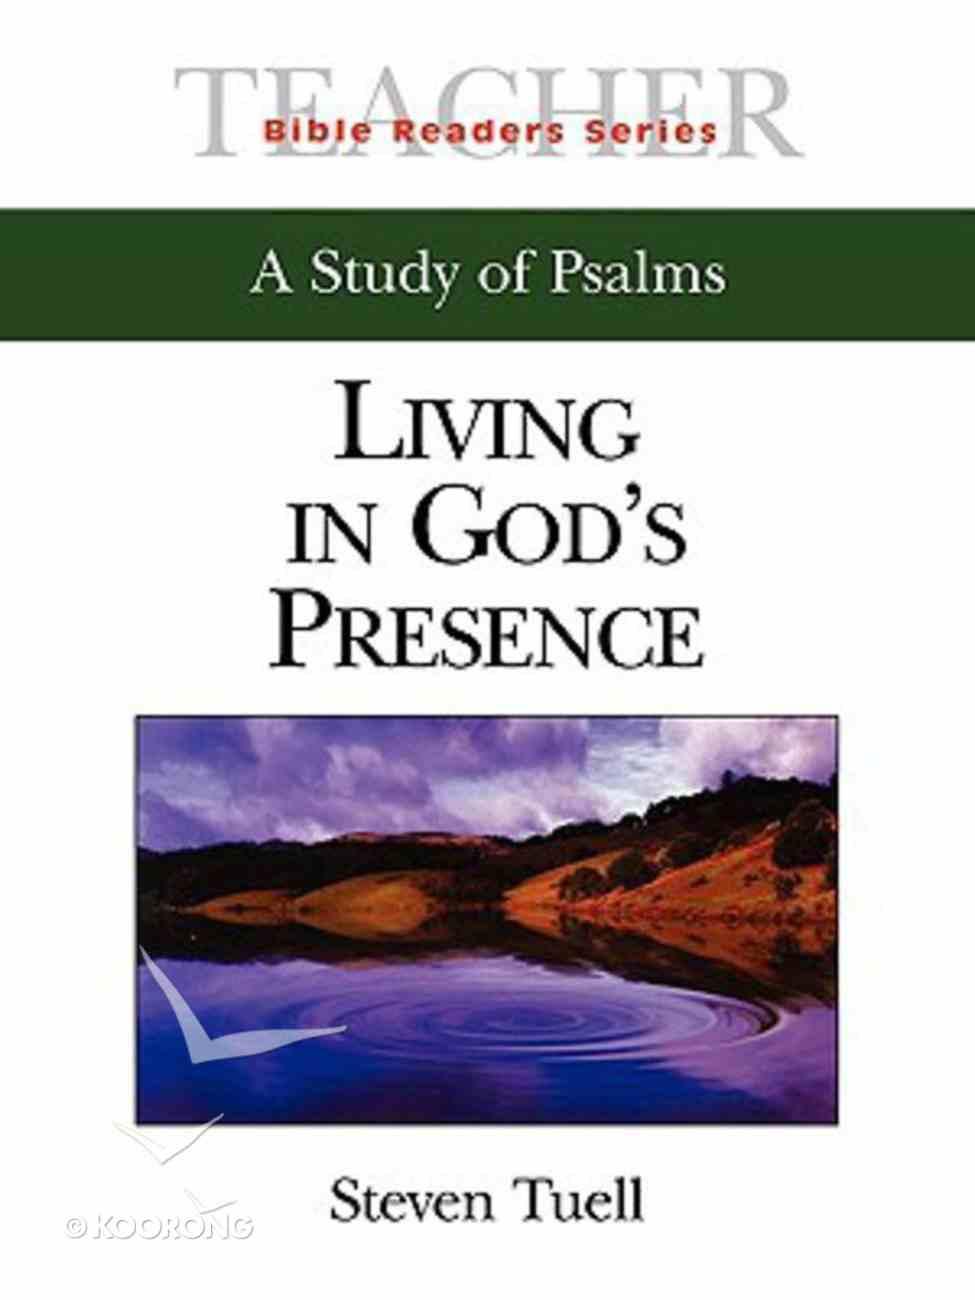 Living in God's Presence (Teacher's Guide) (Abingdon Bible Reader Series) Paperback